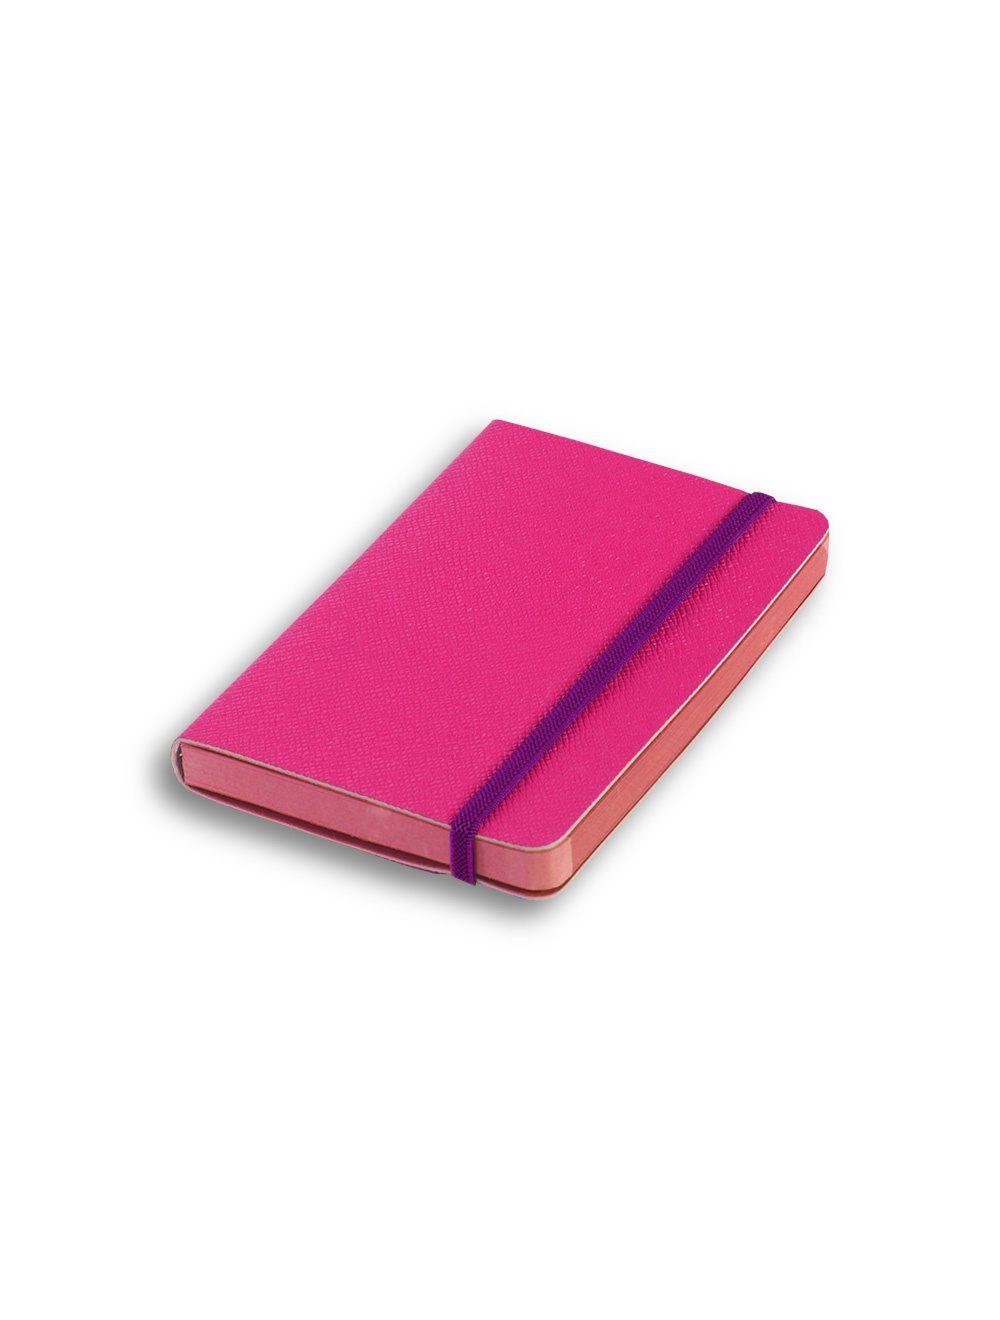 Elastic+ Journal 9 X 14 Cm - Coloured Internal Paper  - Hot Pink